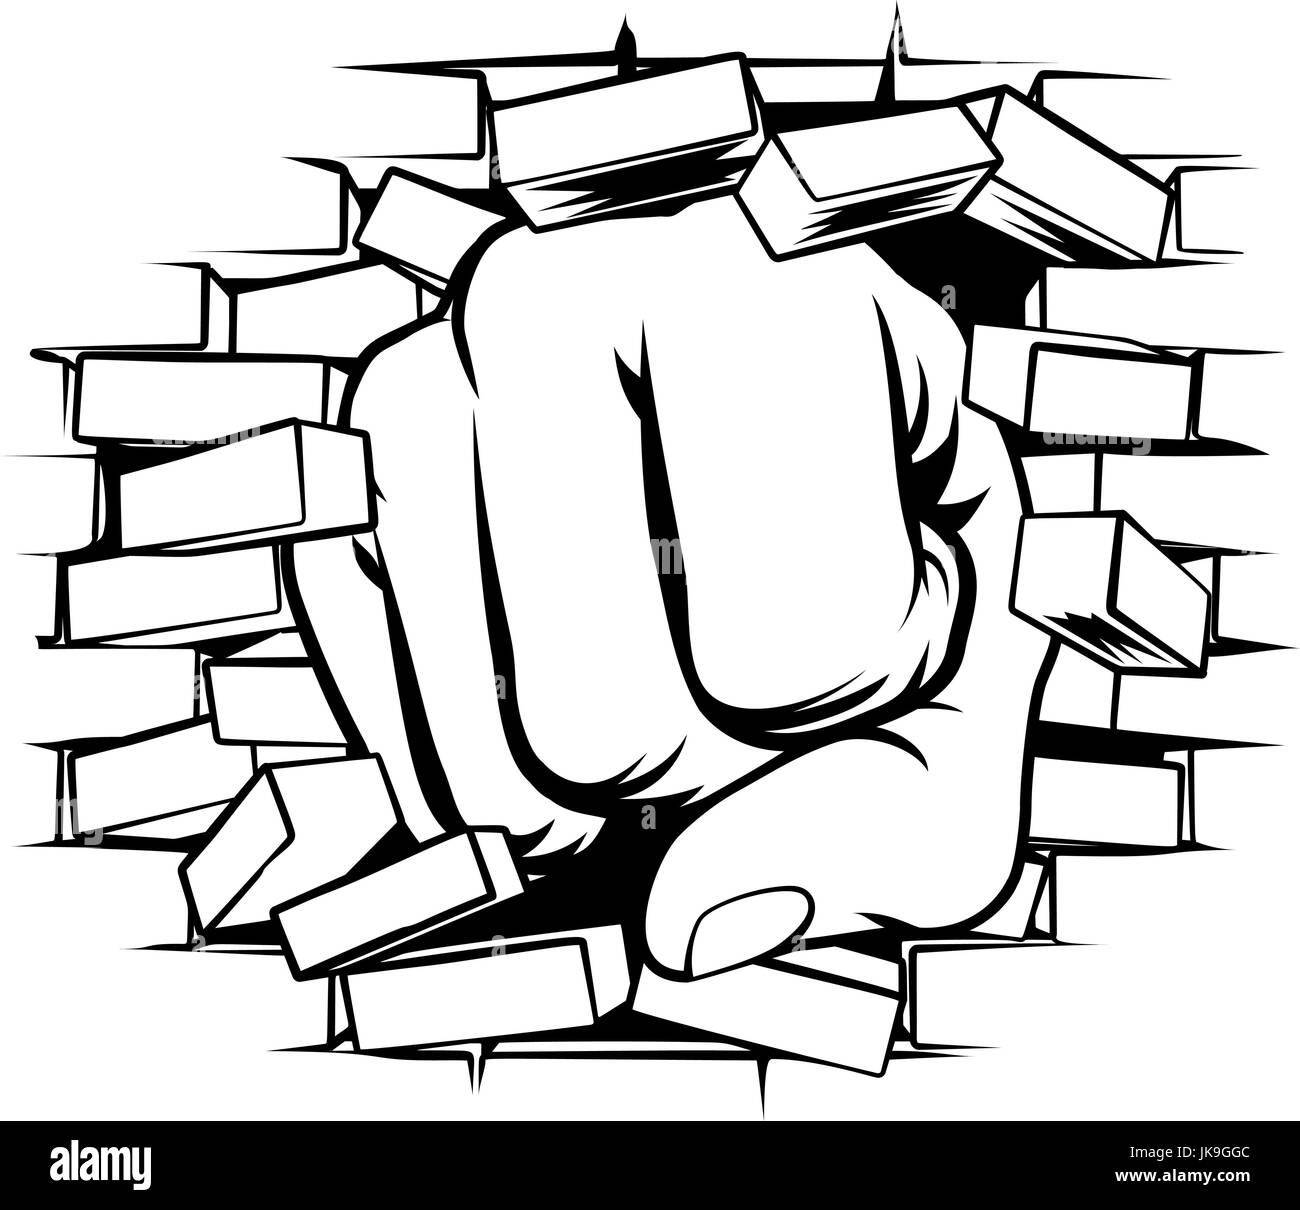 fist punching through brick wall stock vector art illustration rh alamy com